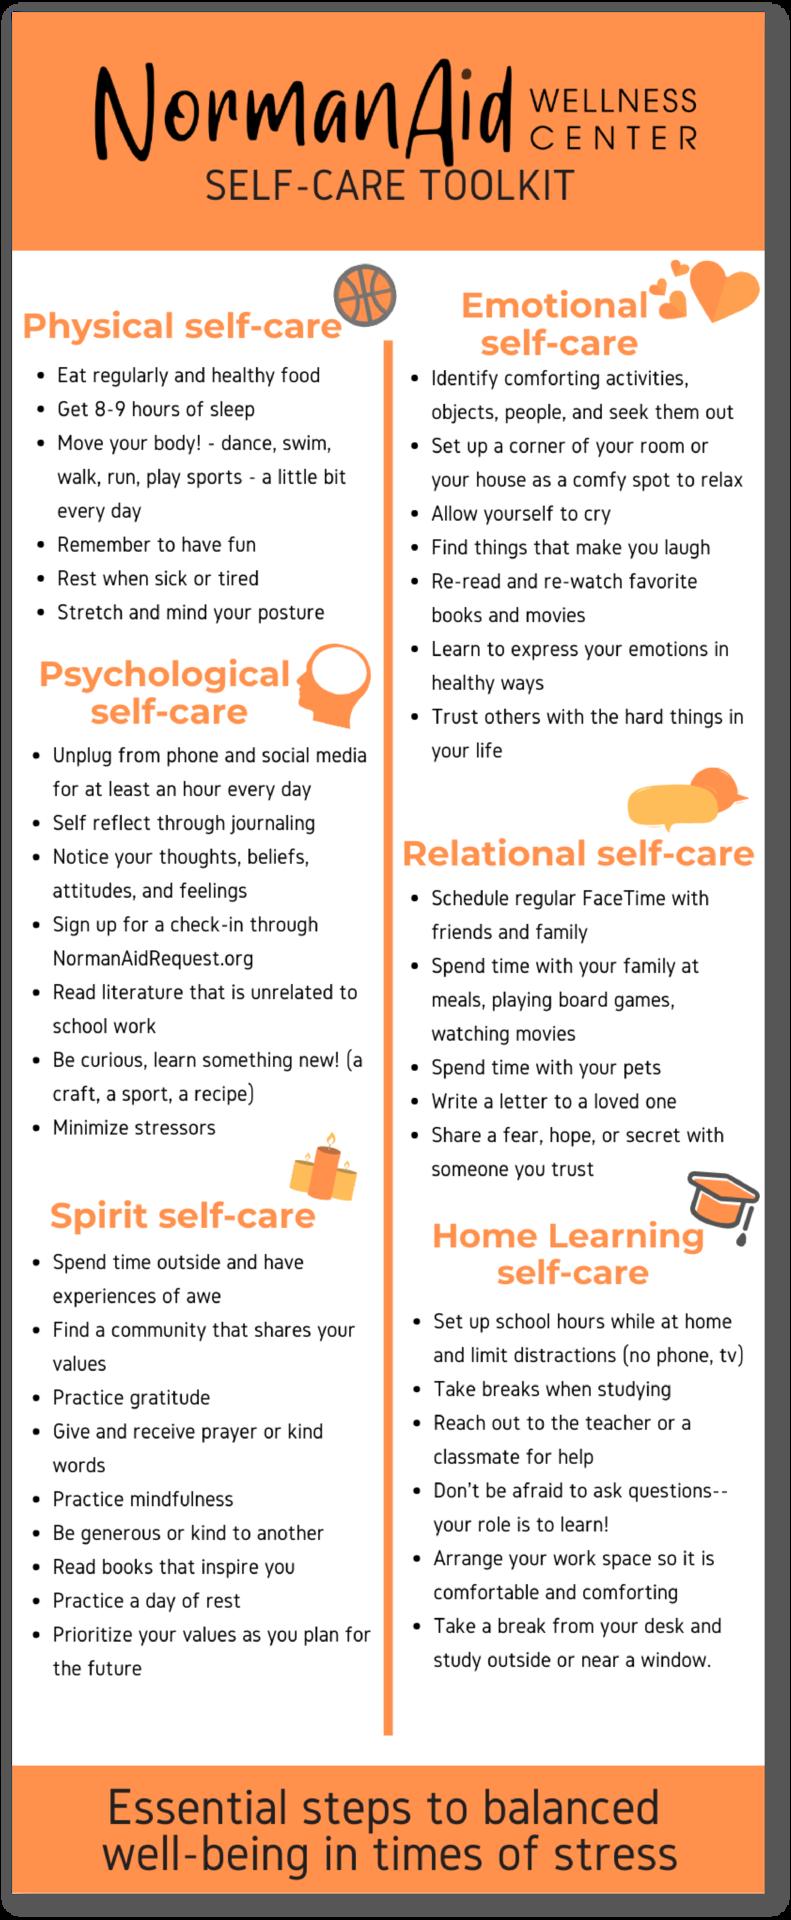 NAWC Self-care tips